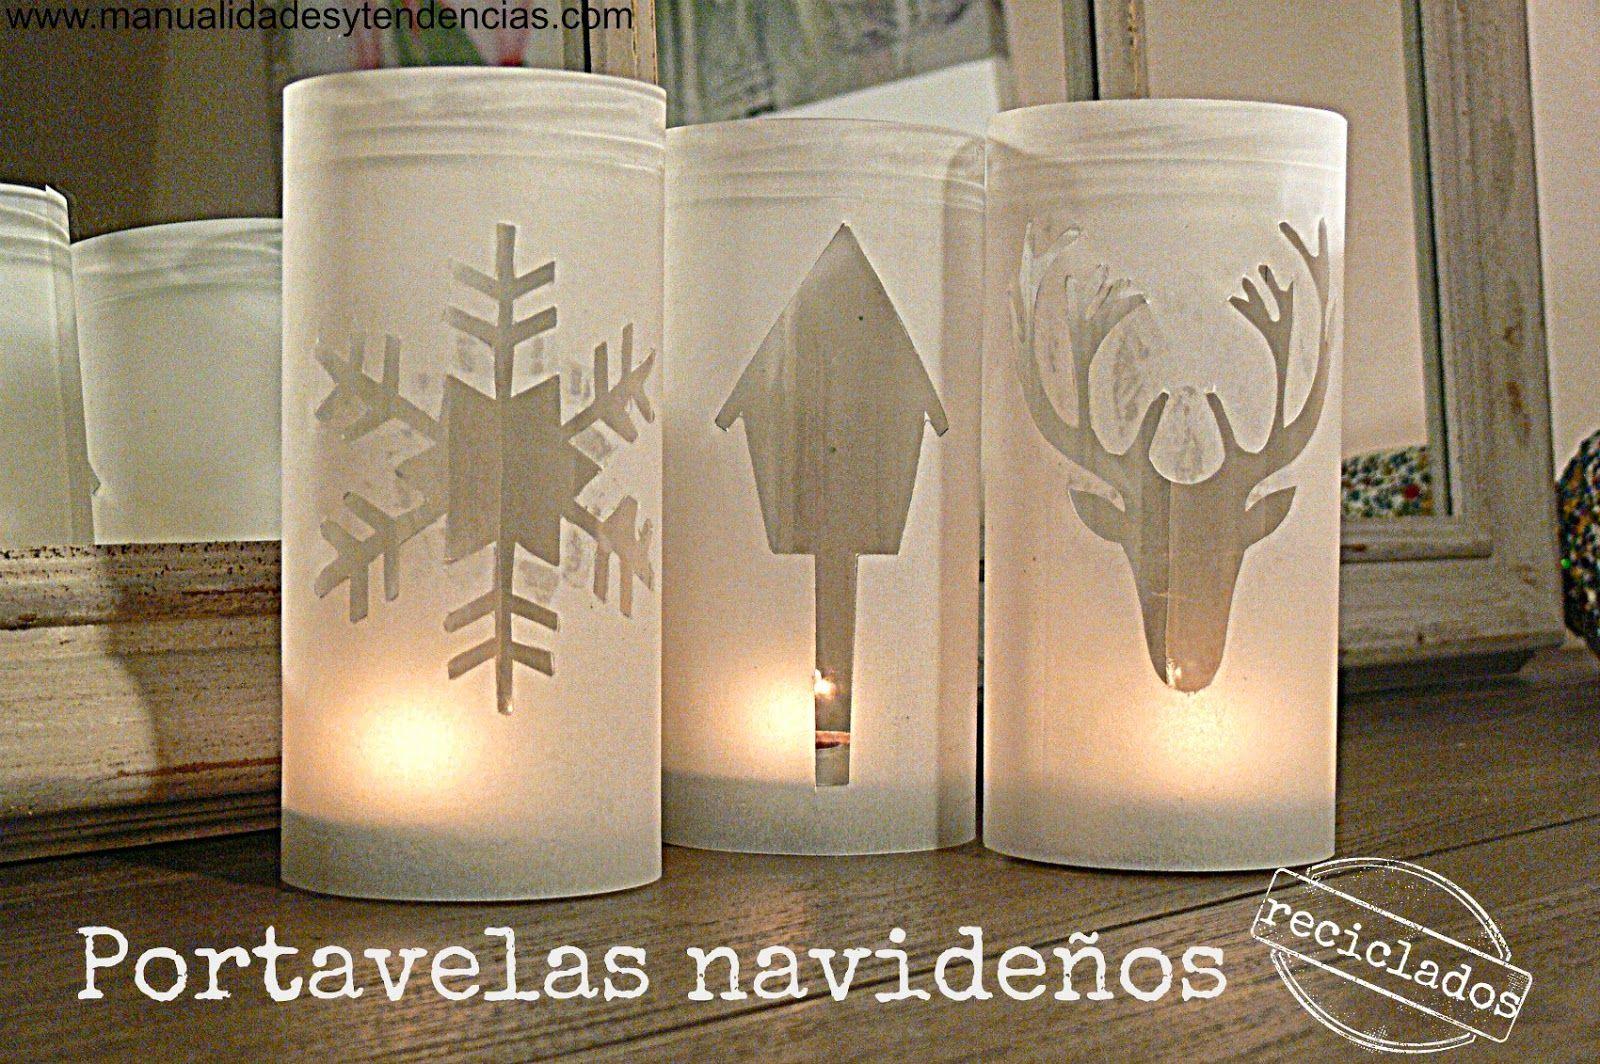 Reciclaje Portavelas Navidenos Recycled Christmas Candle Holder Faroles De Navidad Como Hacer Faroles Navidenos Faroles Navidenos